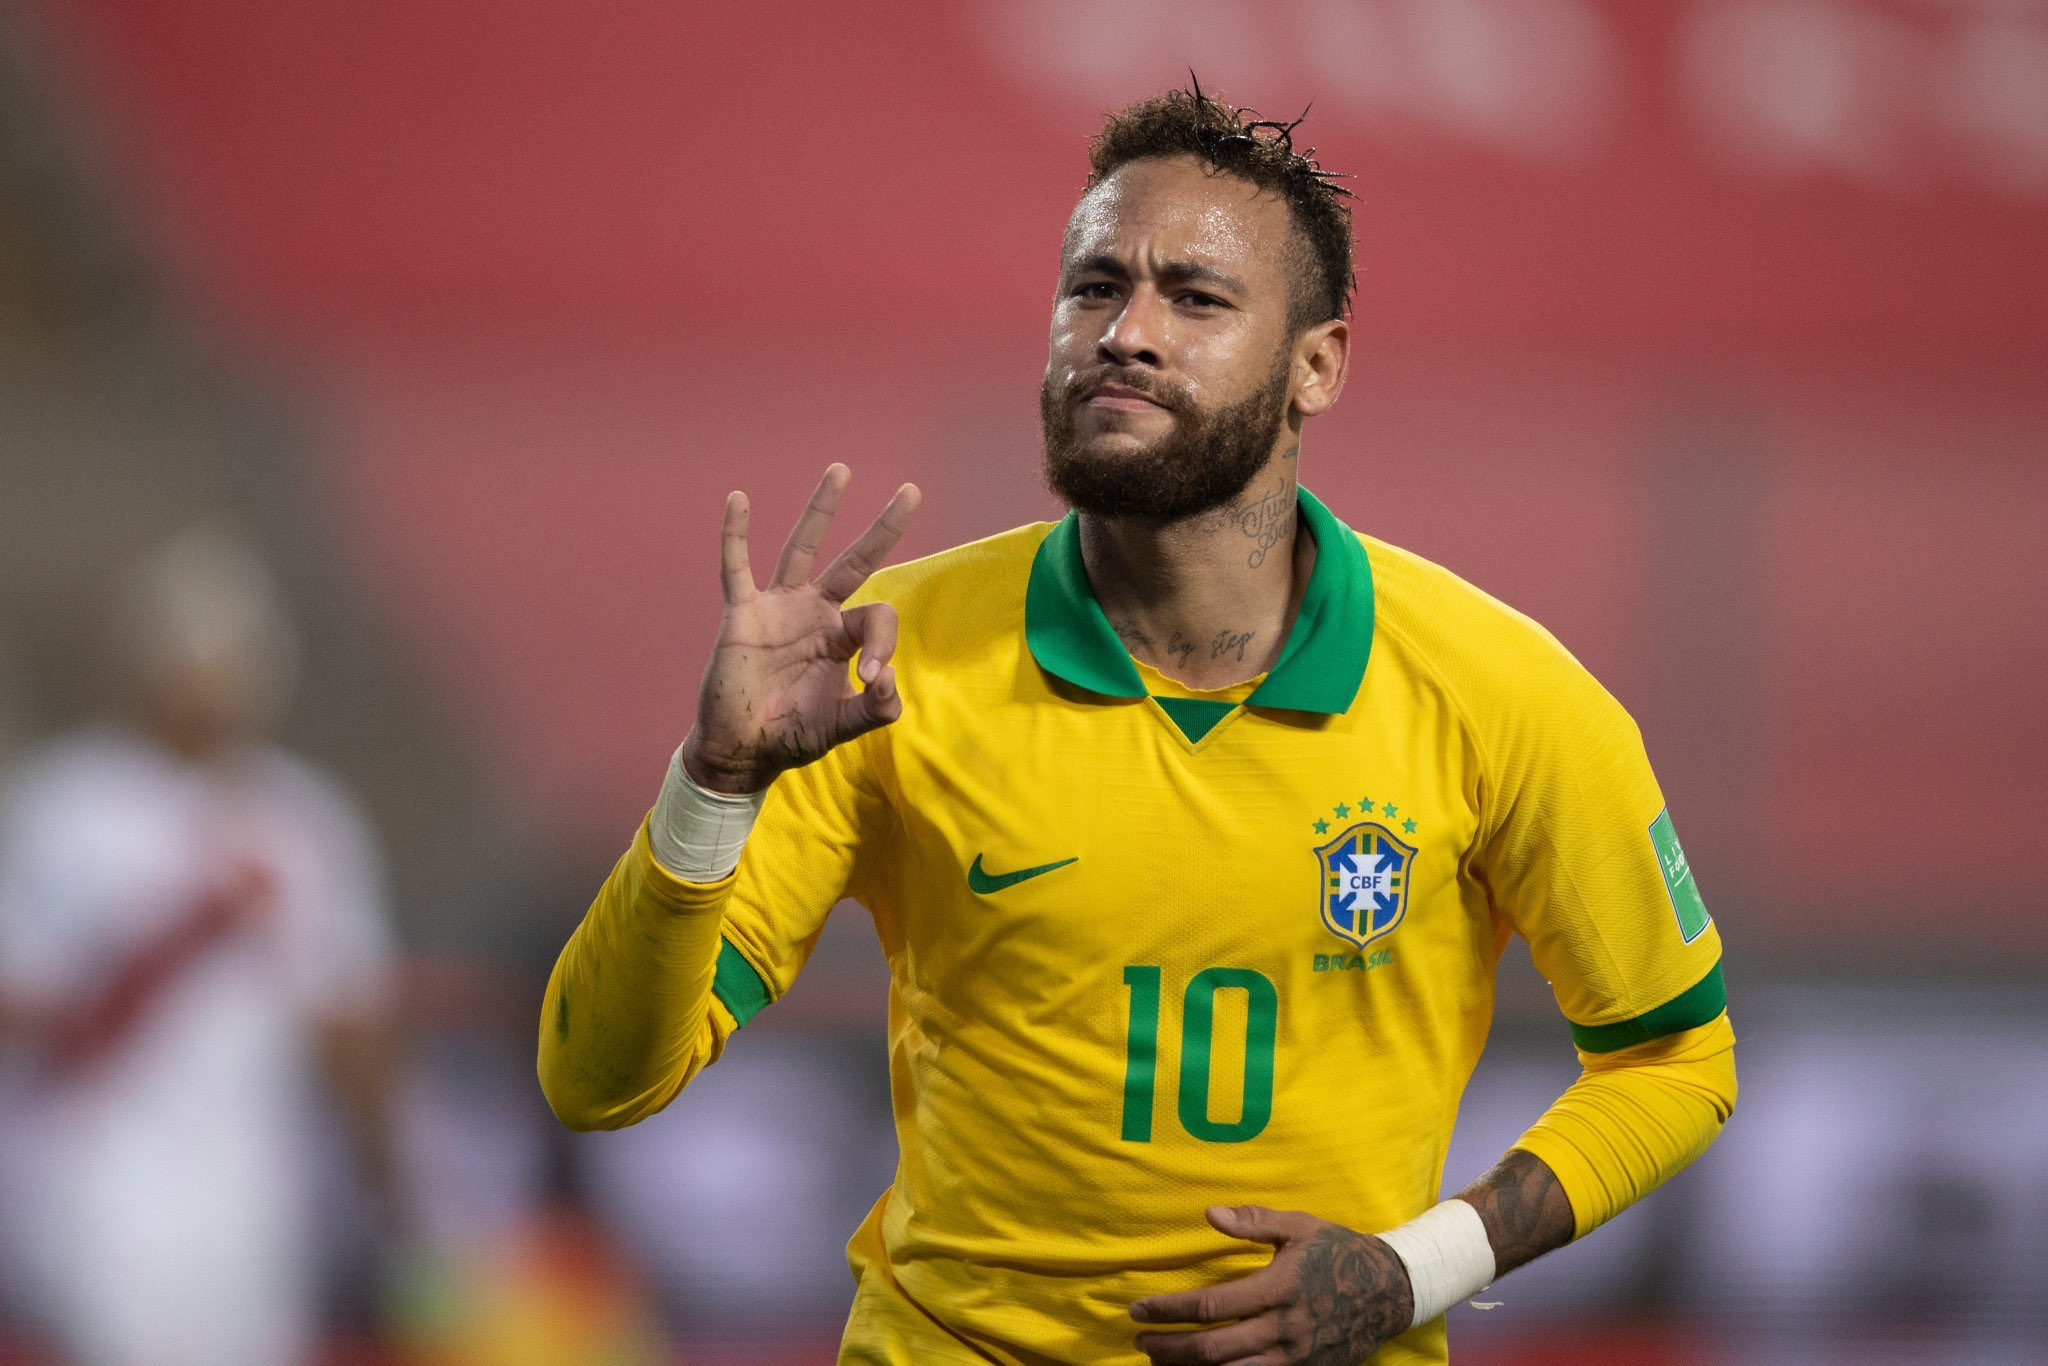 All the latest everton news. Neymar moves second behind Brazil's leading goalscorer Pele